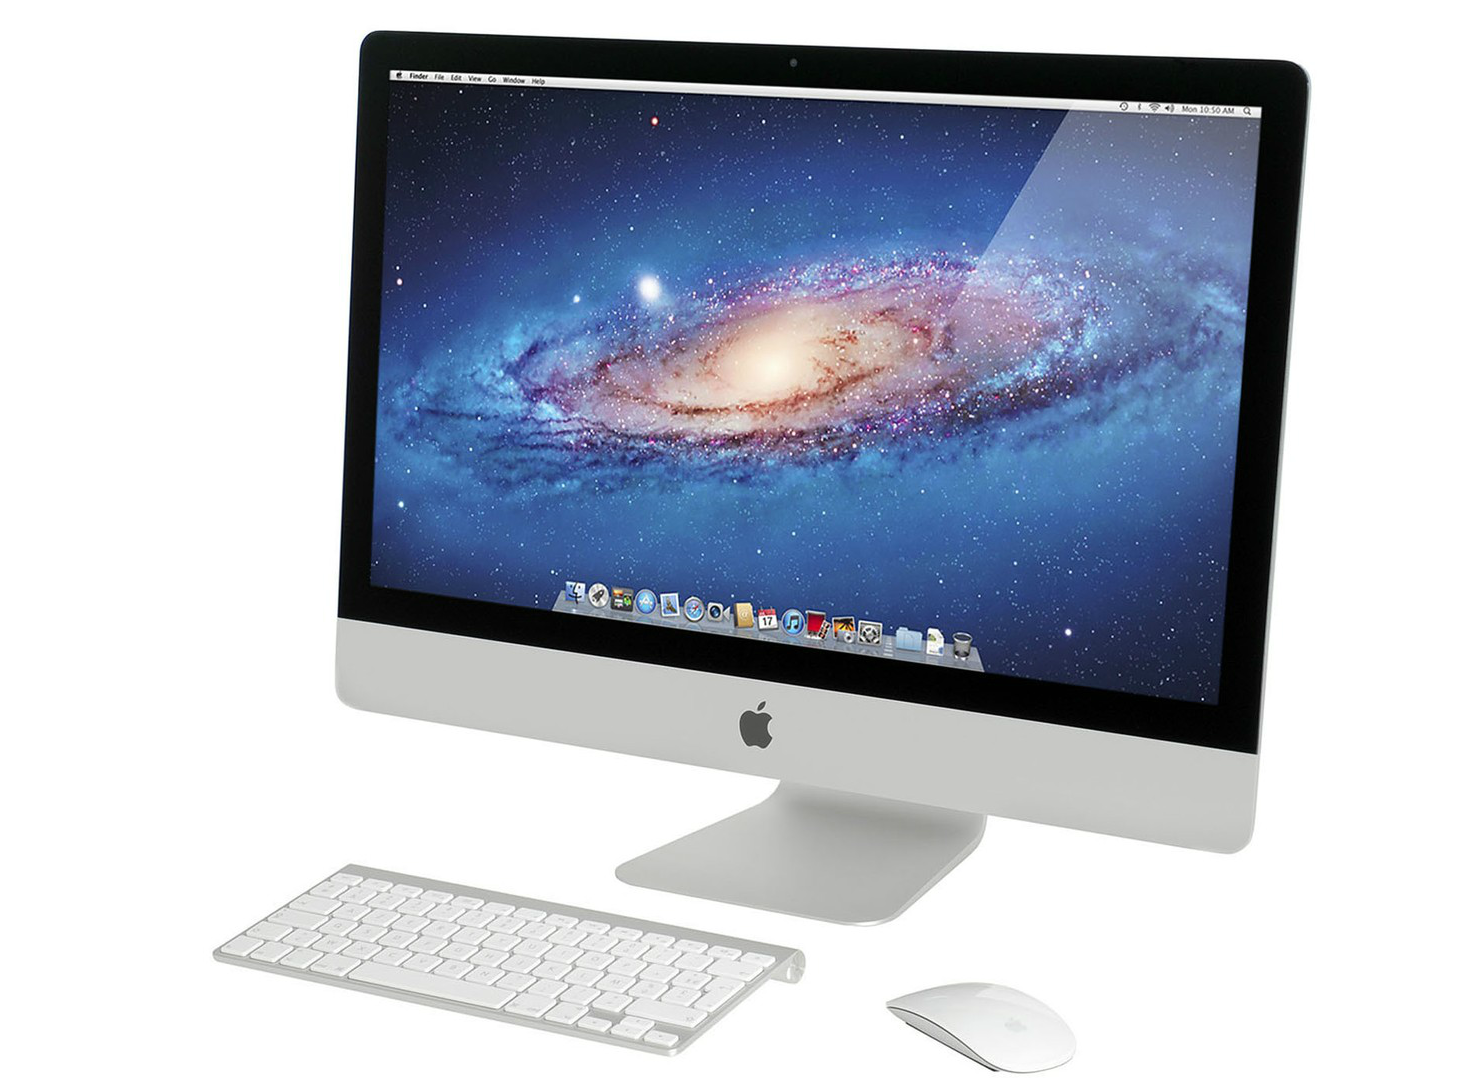 photo apple imac 27 39 39 intel core i5 3 2 ghz apple imac 27 39 39 intel core i5 3 2 ghz 66838. Black Bedroom Furniture Sets. Home Design Ideas